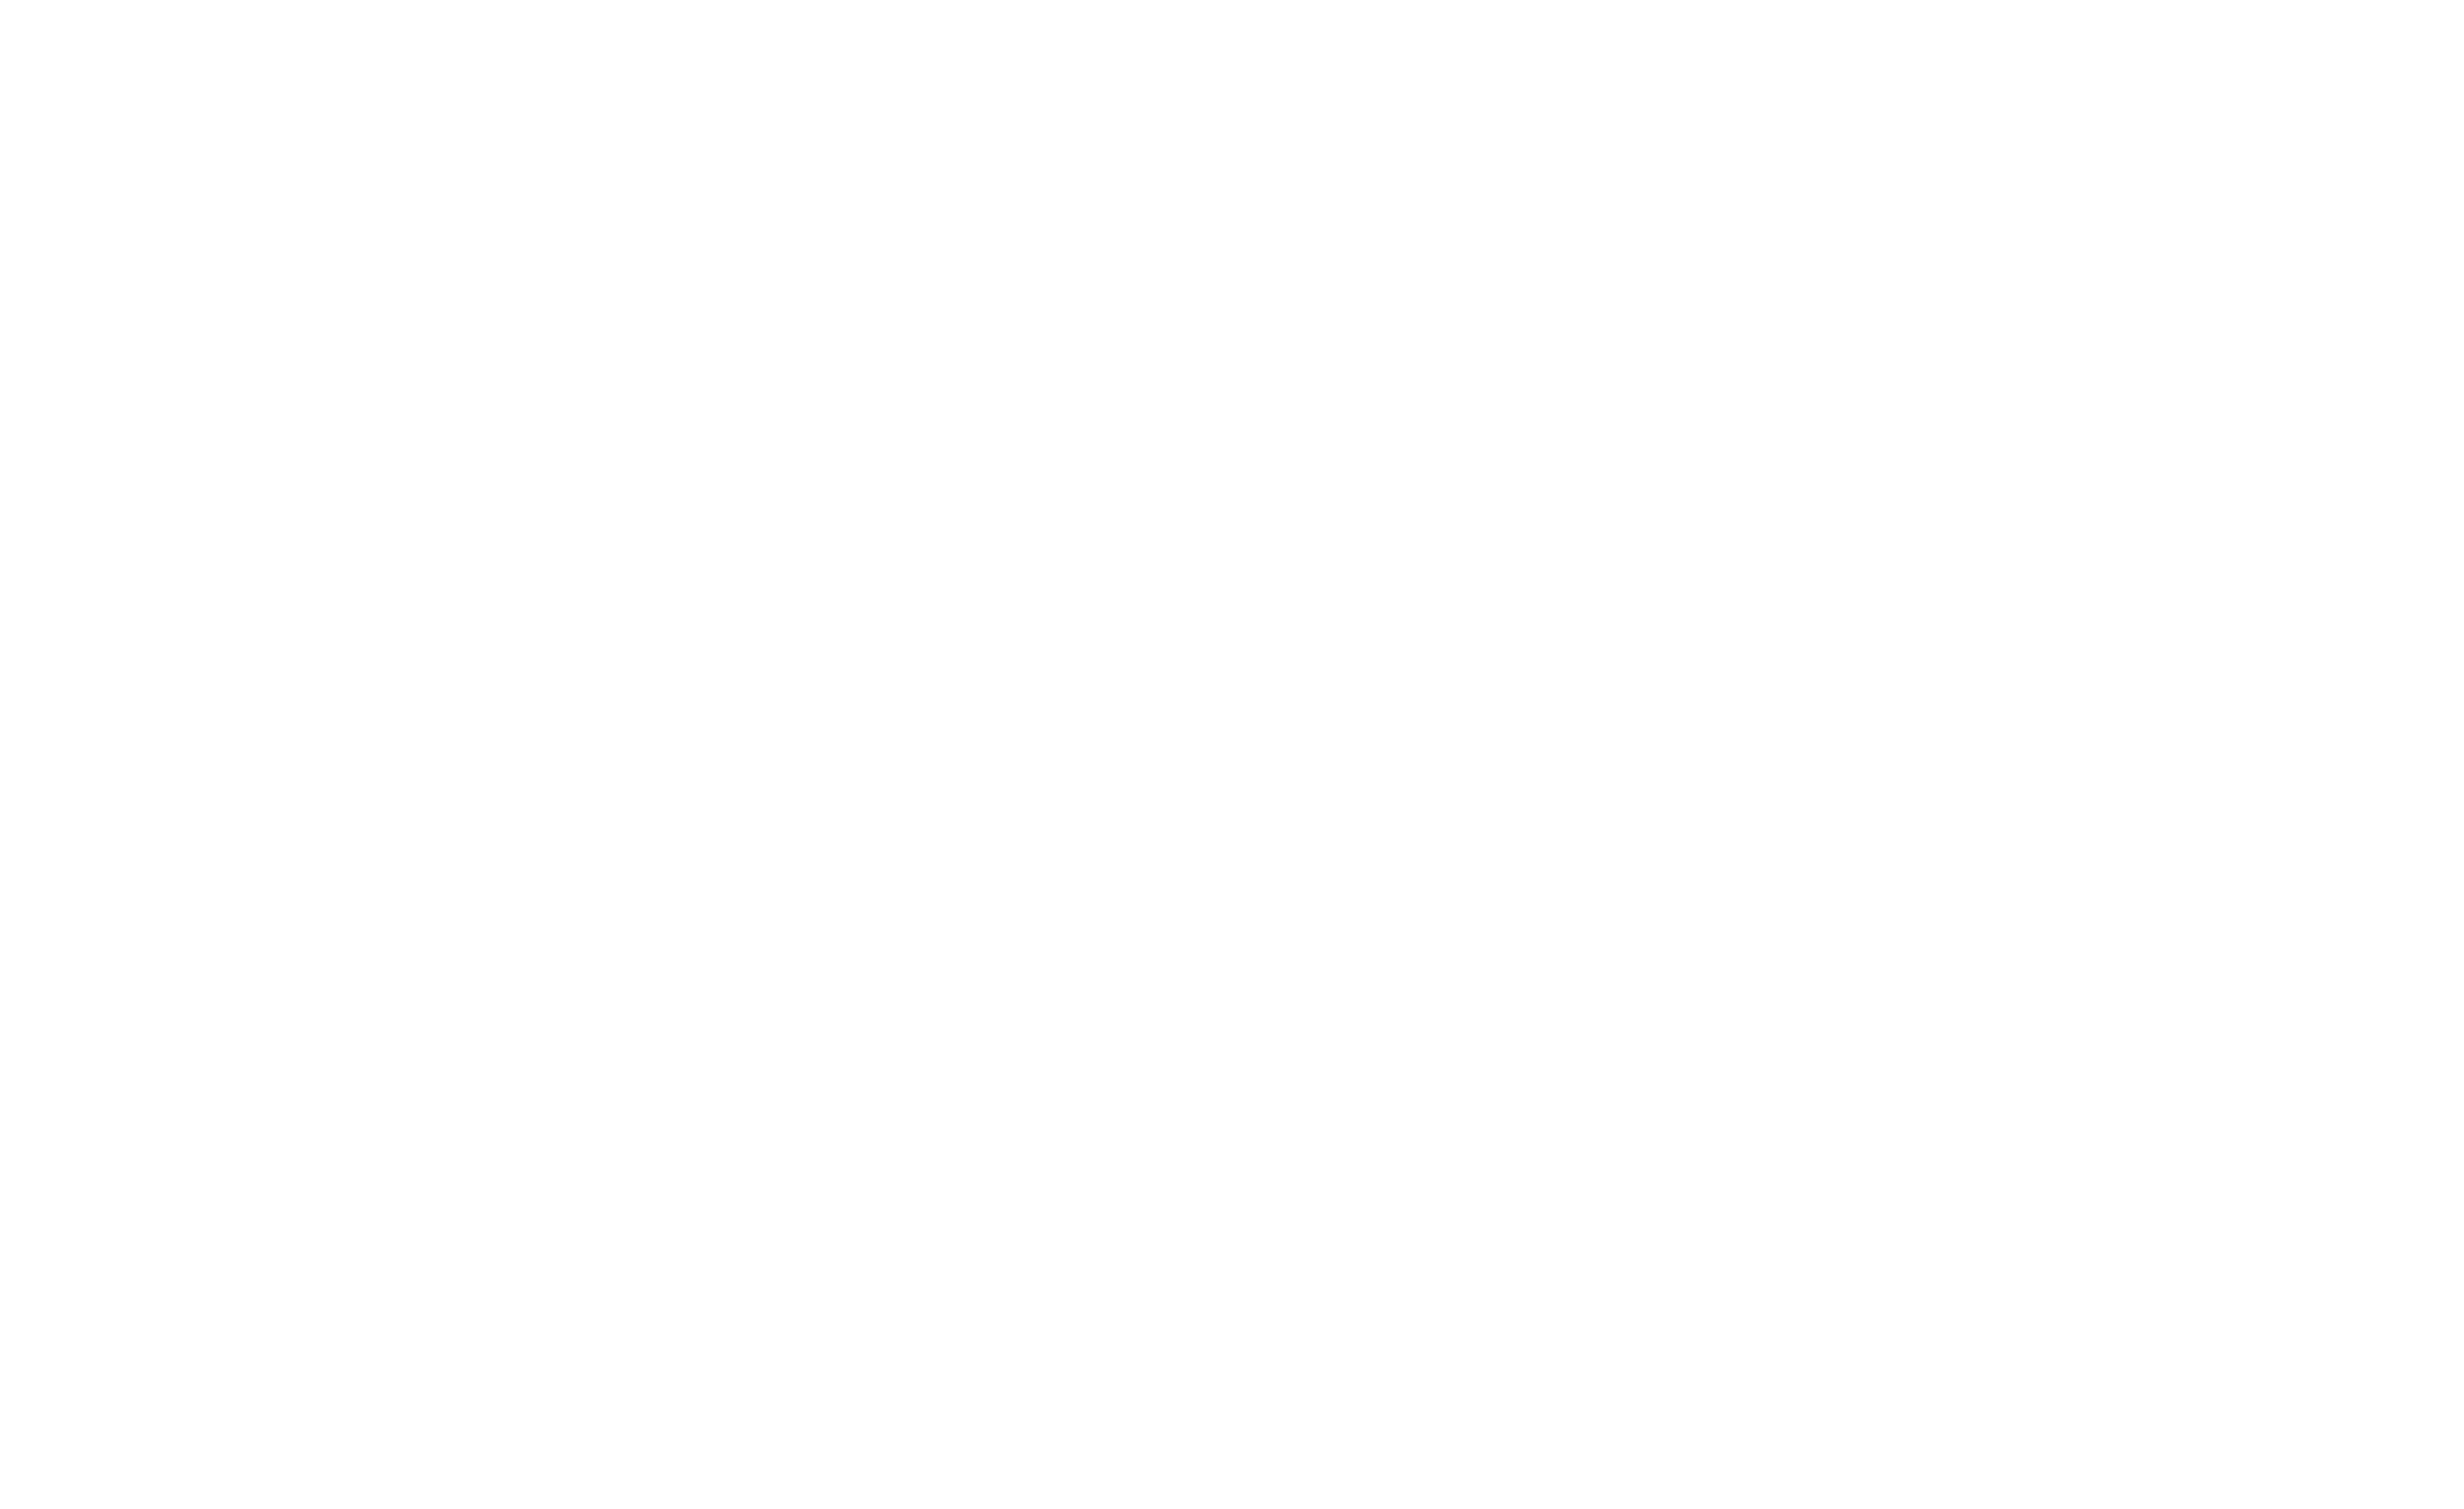 Perennial-Theory.png